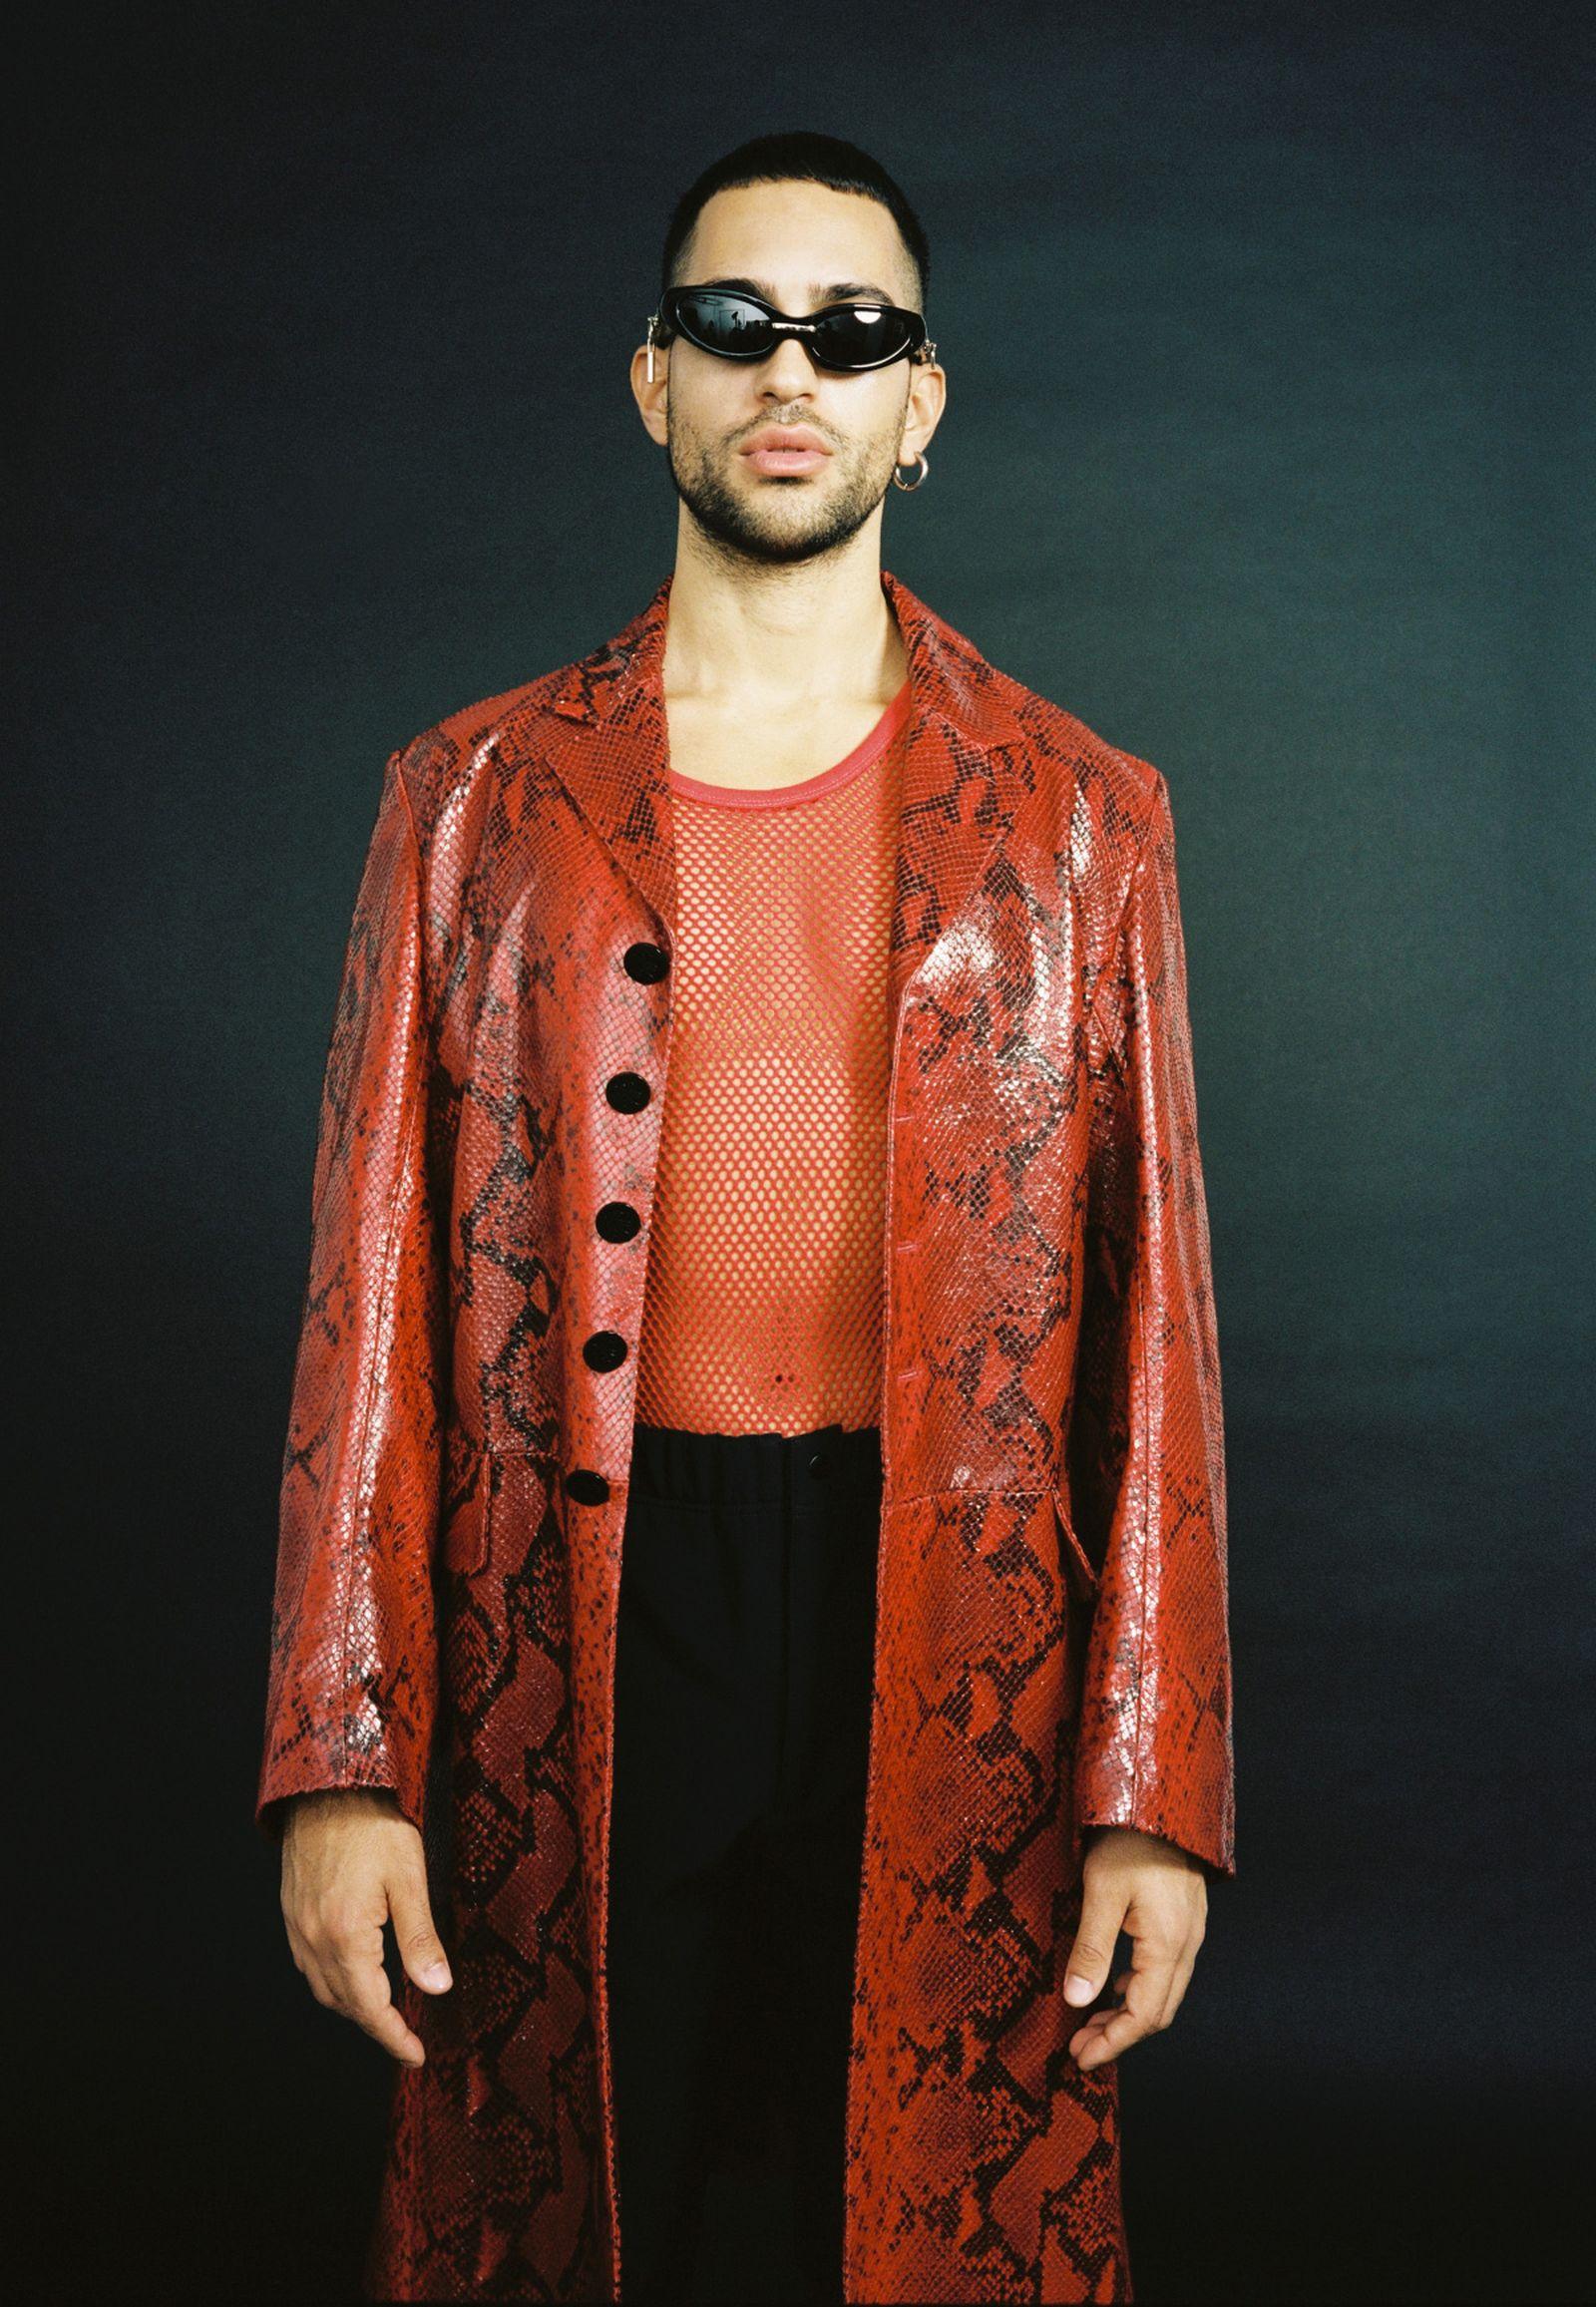 coat, PAUL SMITH pants, CARHARTT WIP  tank top, VITNAGE sunglasses, GENTLE MONSTER